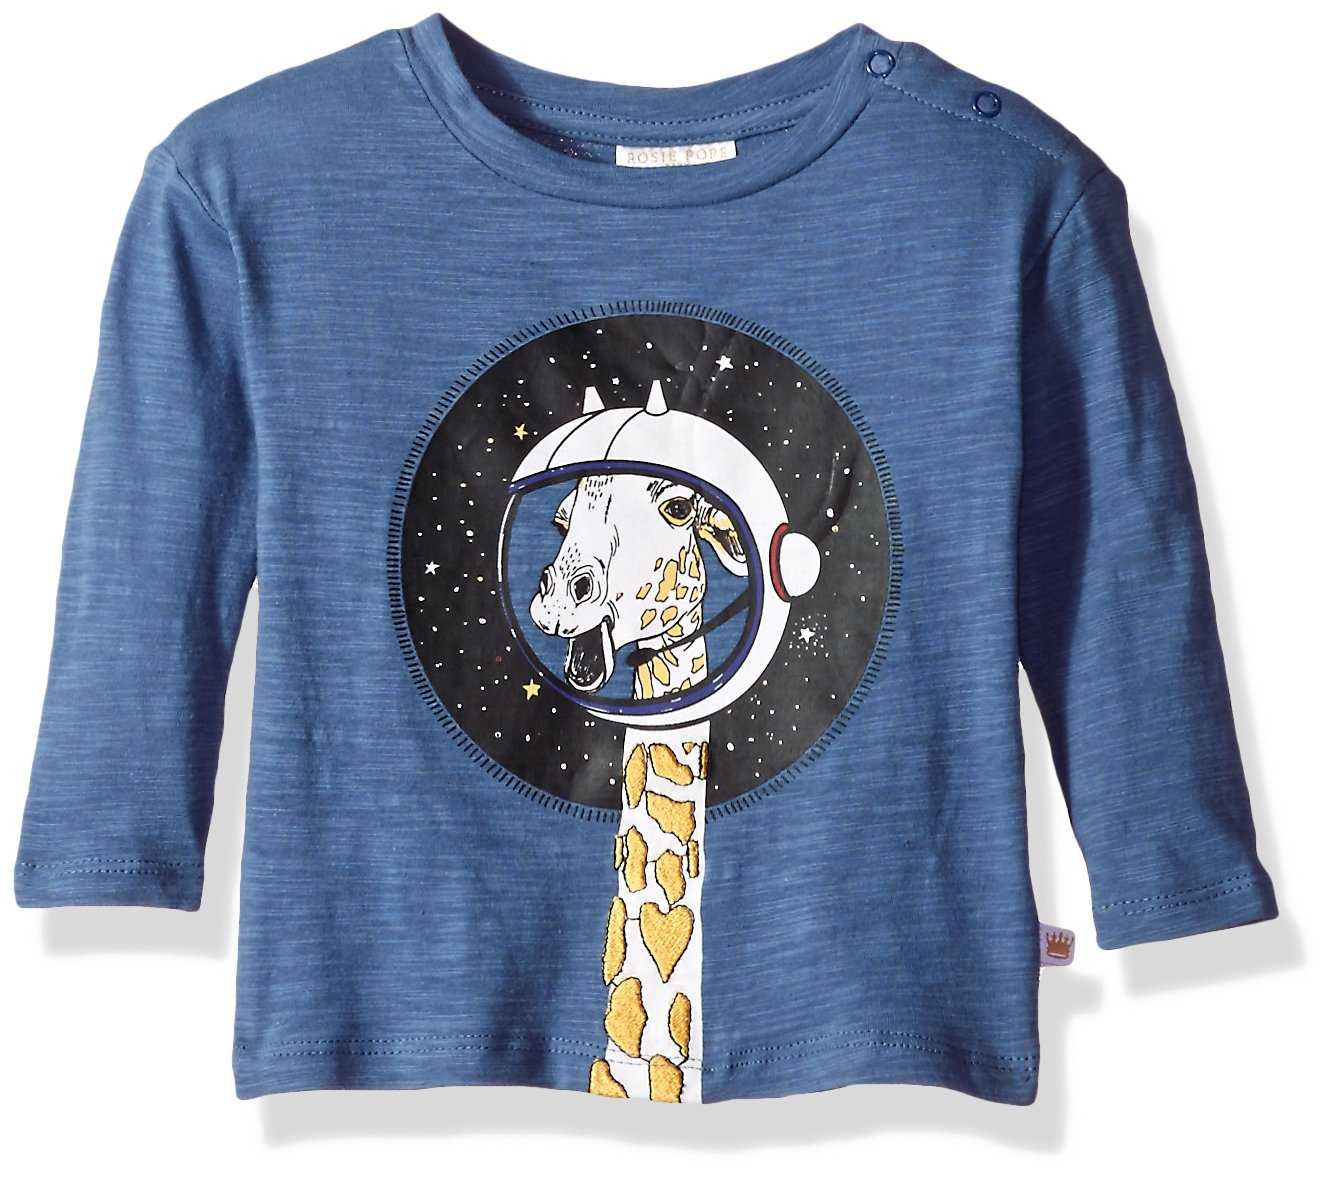 Rosie Pope Baby Boys Giraffe in Space Tee, Blue, 18M